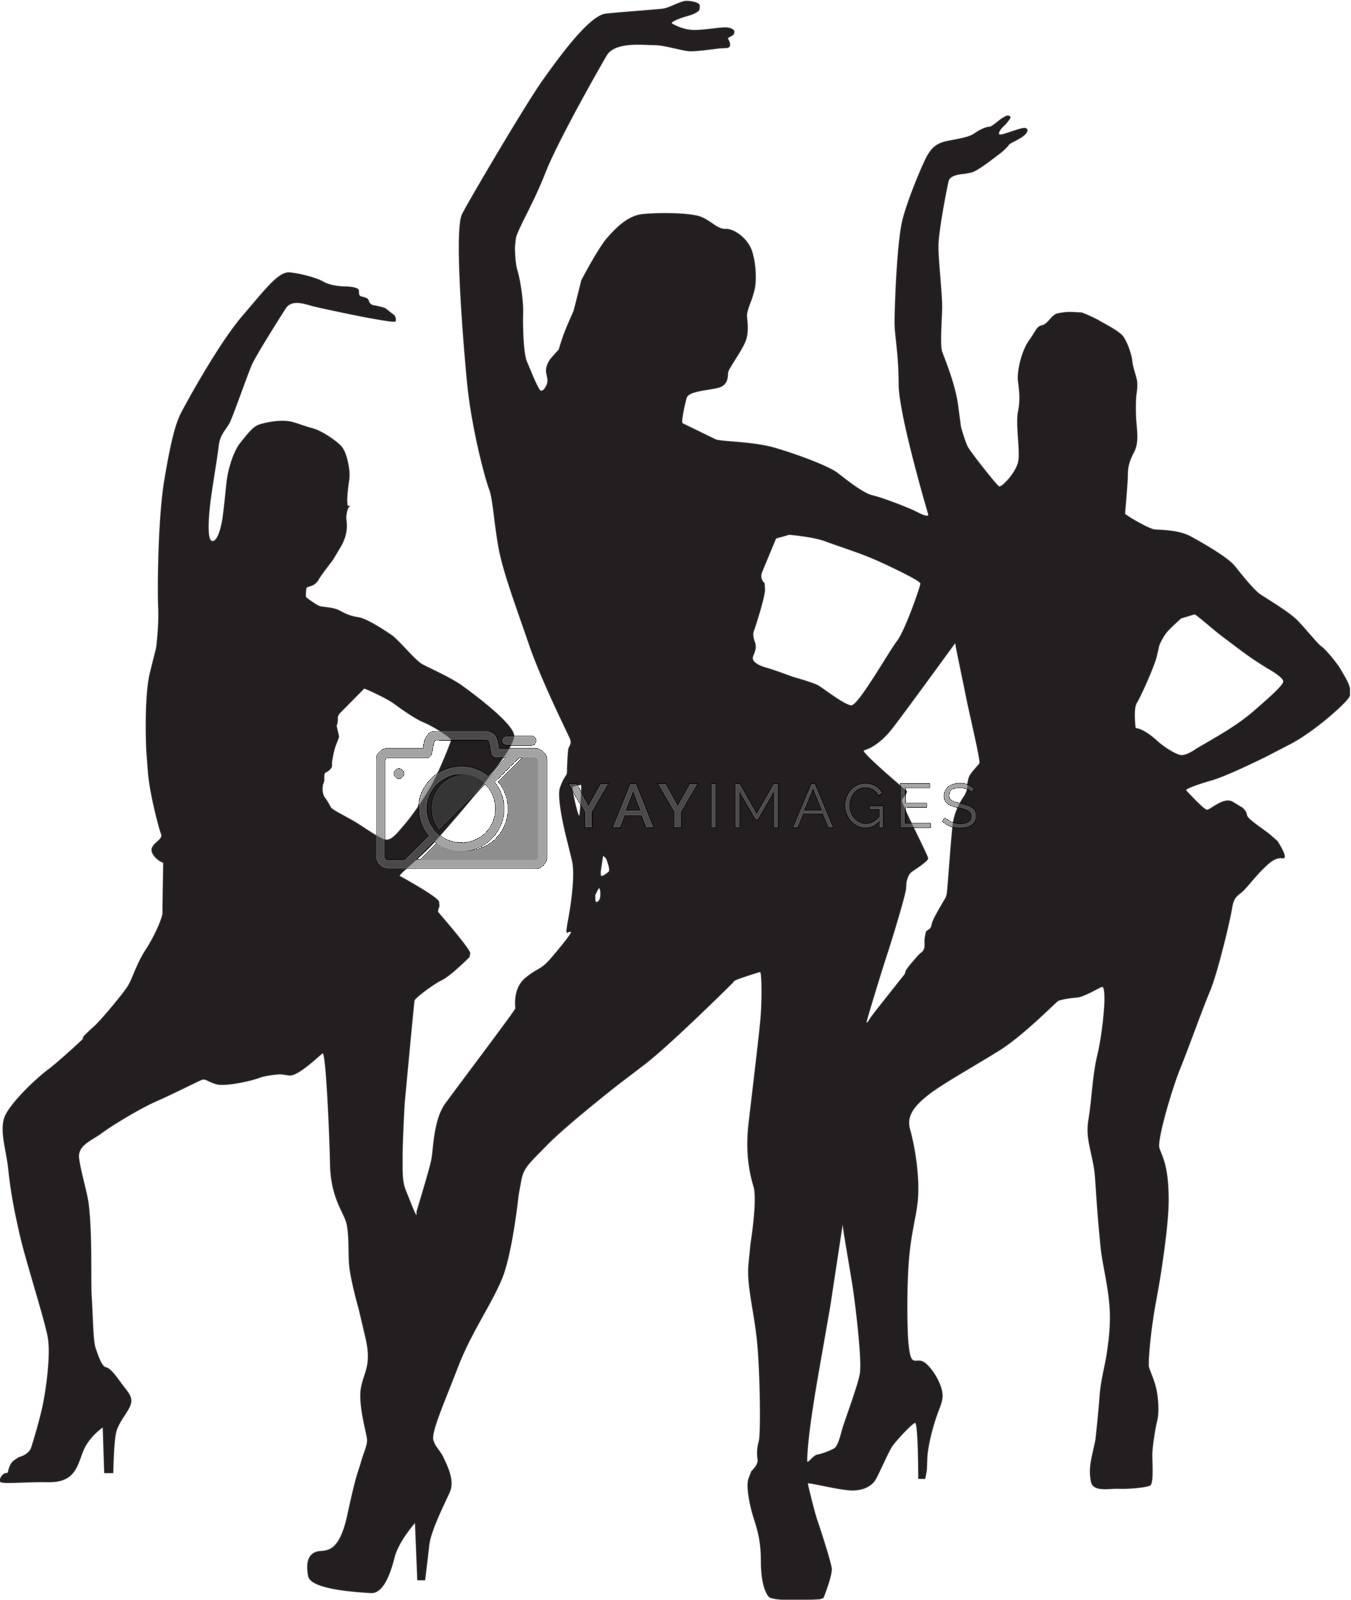 Silhouette dancers